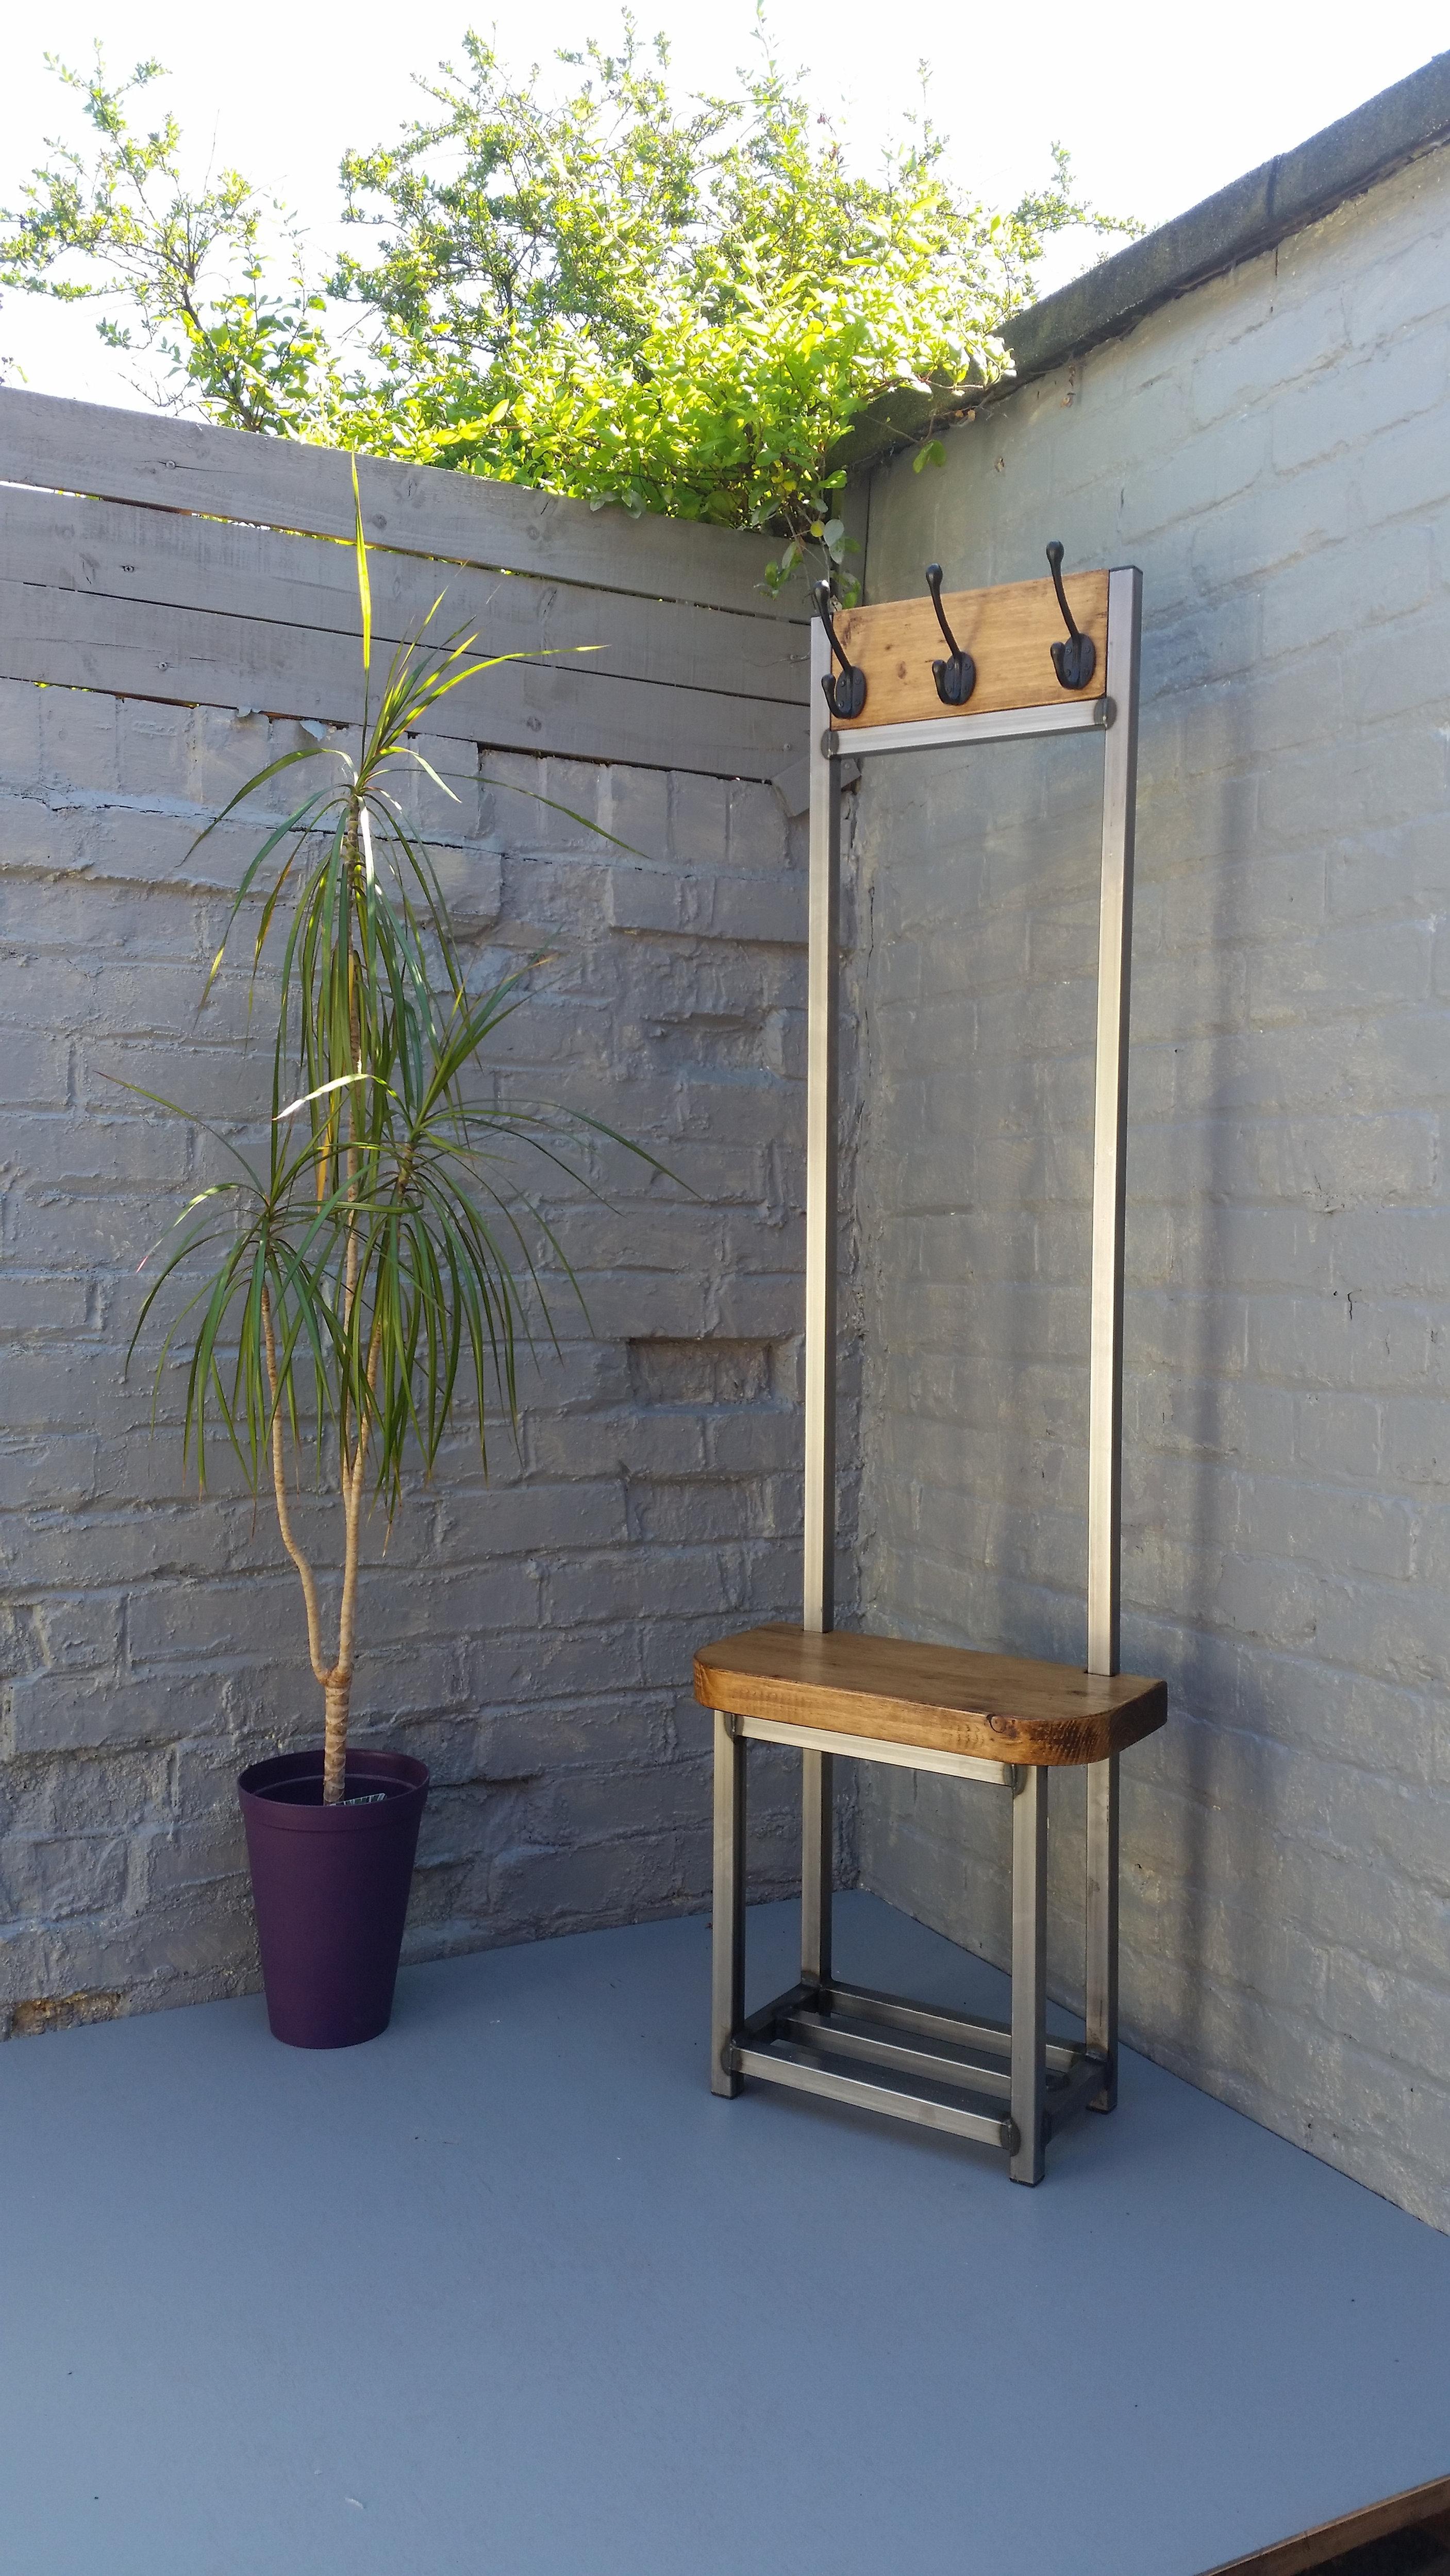 324 Coat Stand Narrow Hallway Bijou Coat Rack Bench Seat And Shoe Storage Ideal